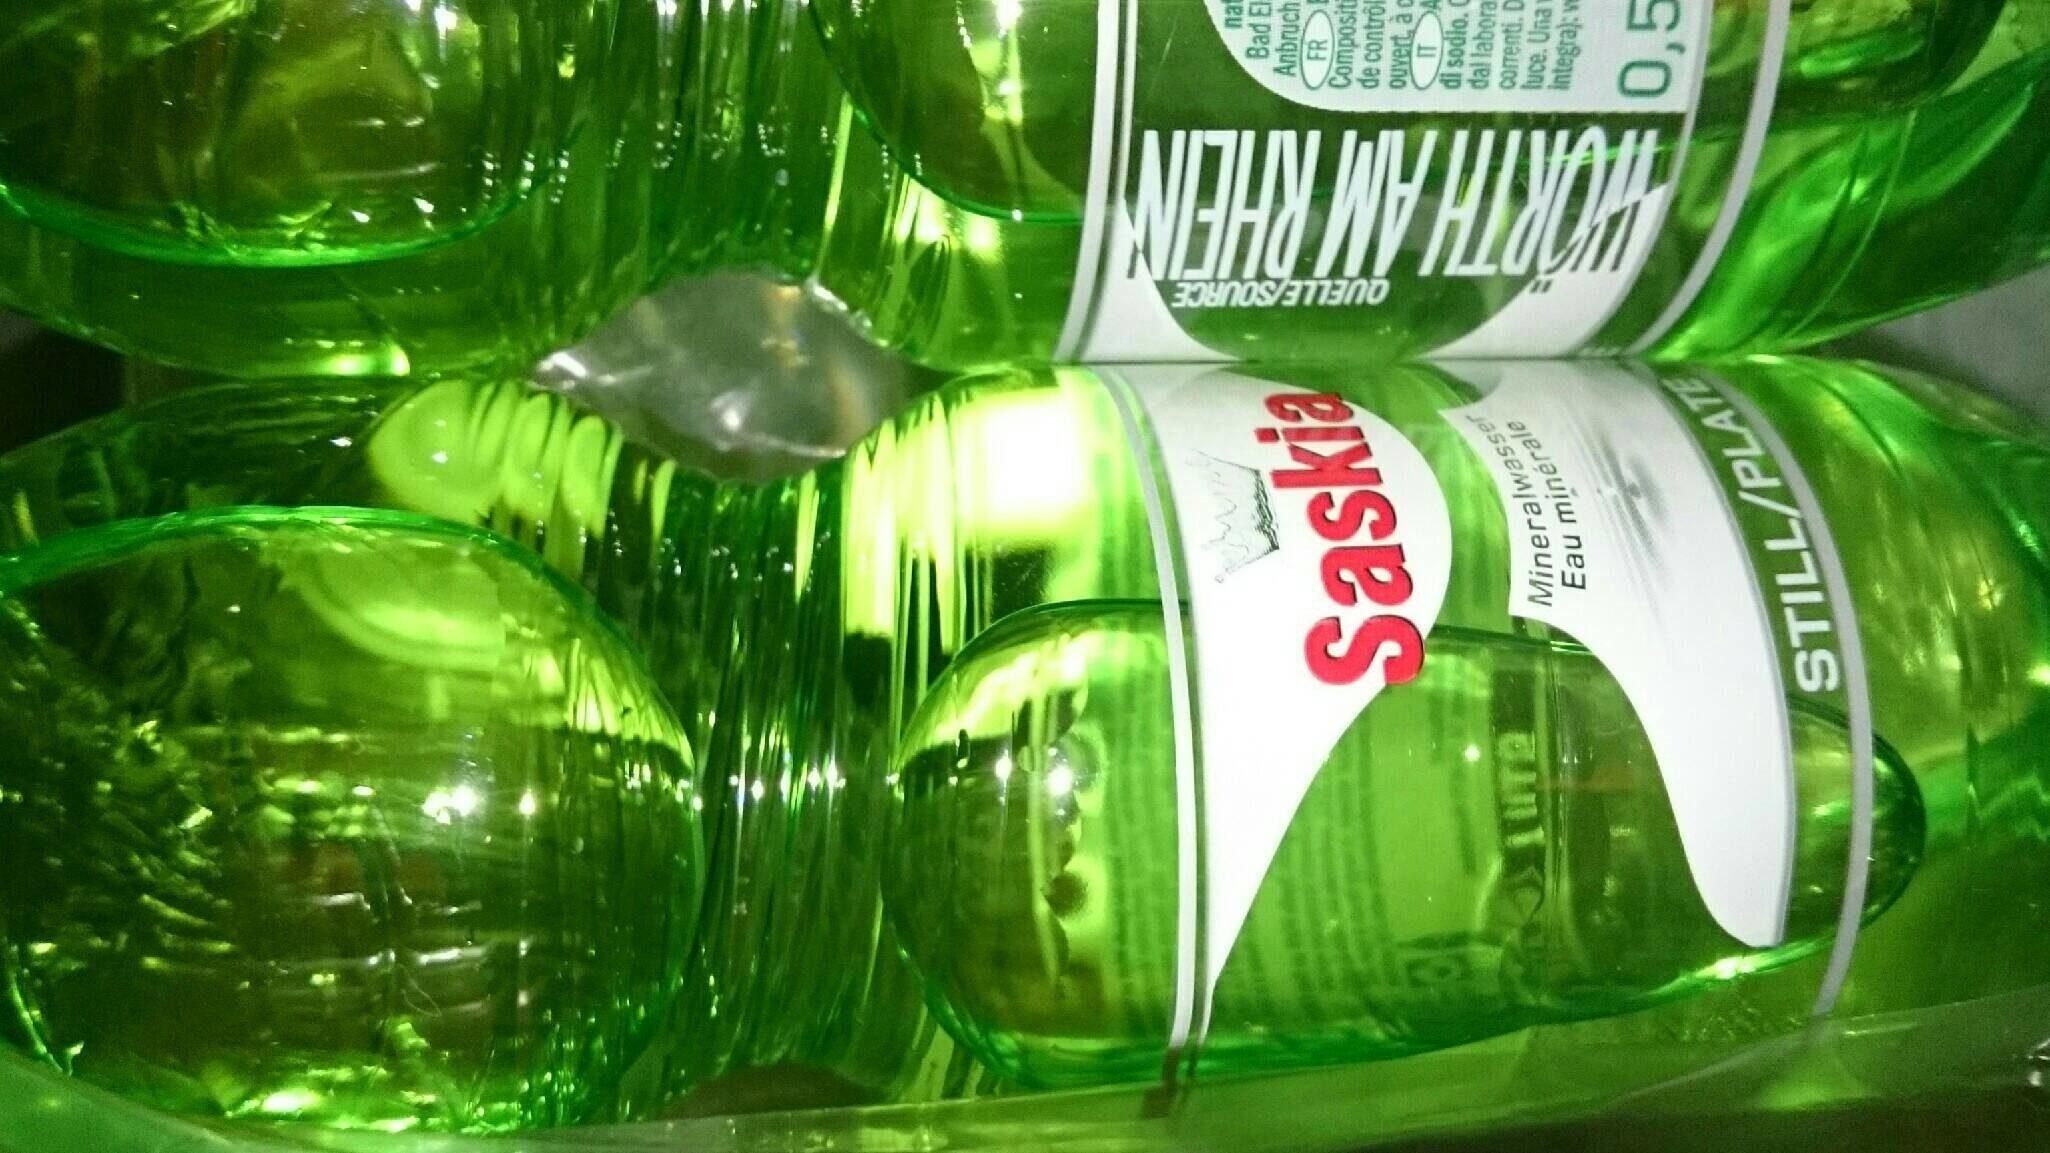 Mineralwasser still 6er Pack - Product - en